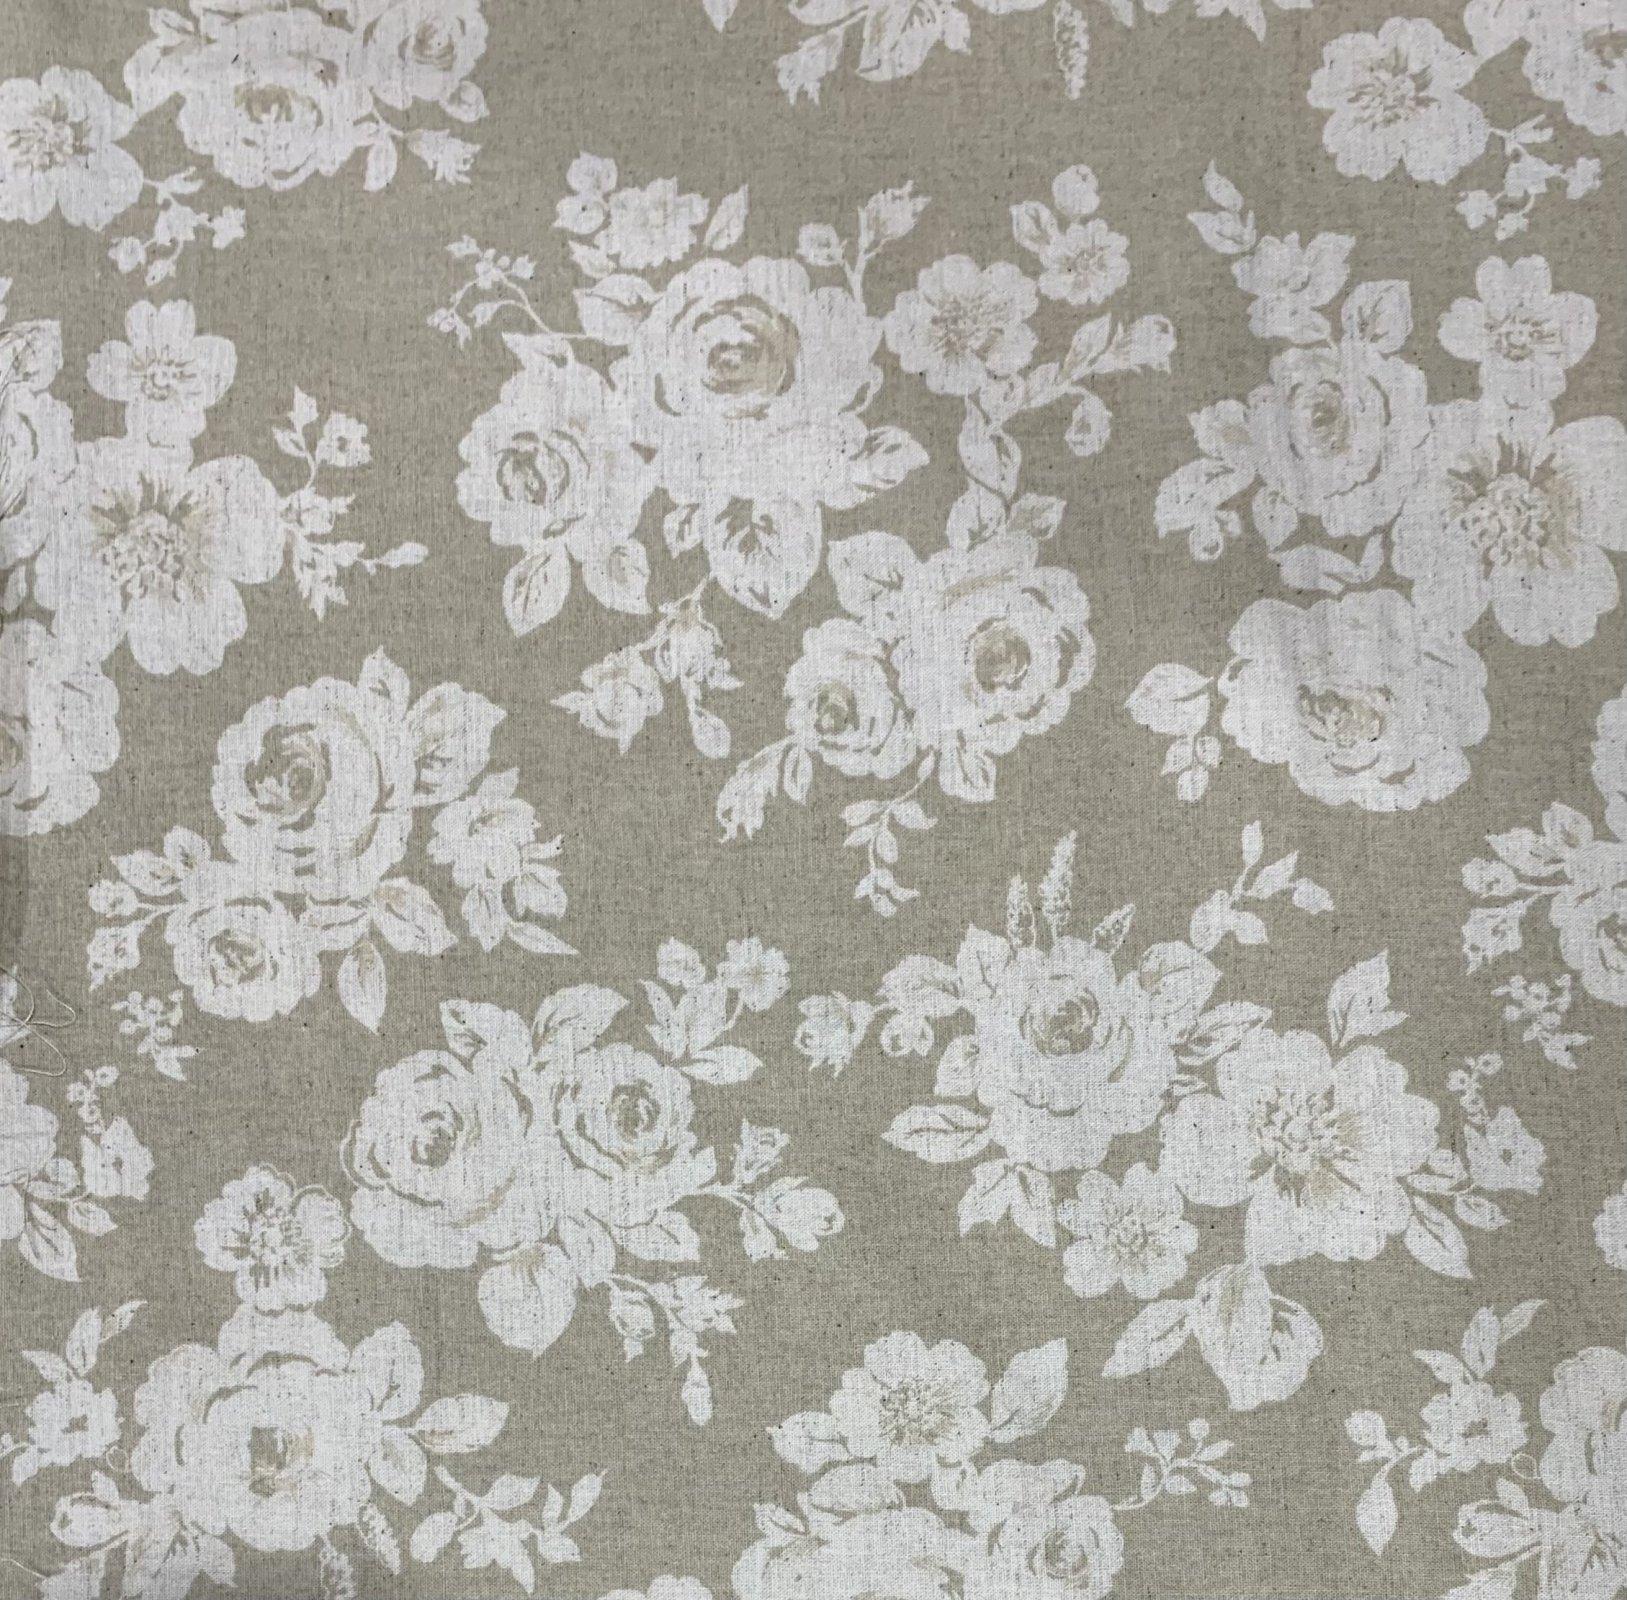 Kokka Fabric - Natural Floral